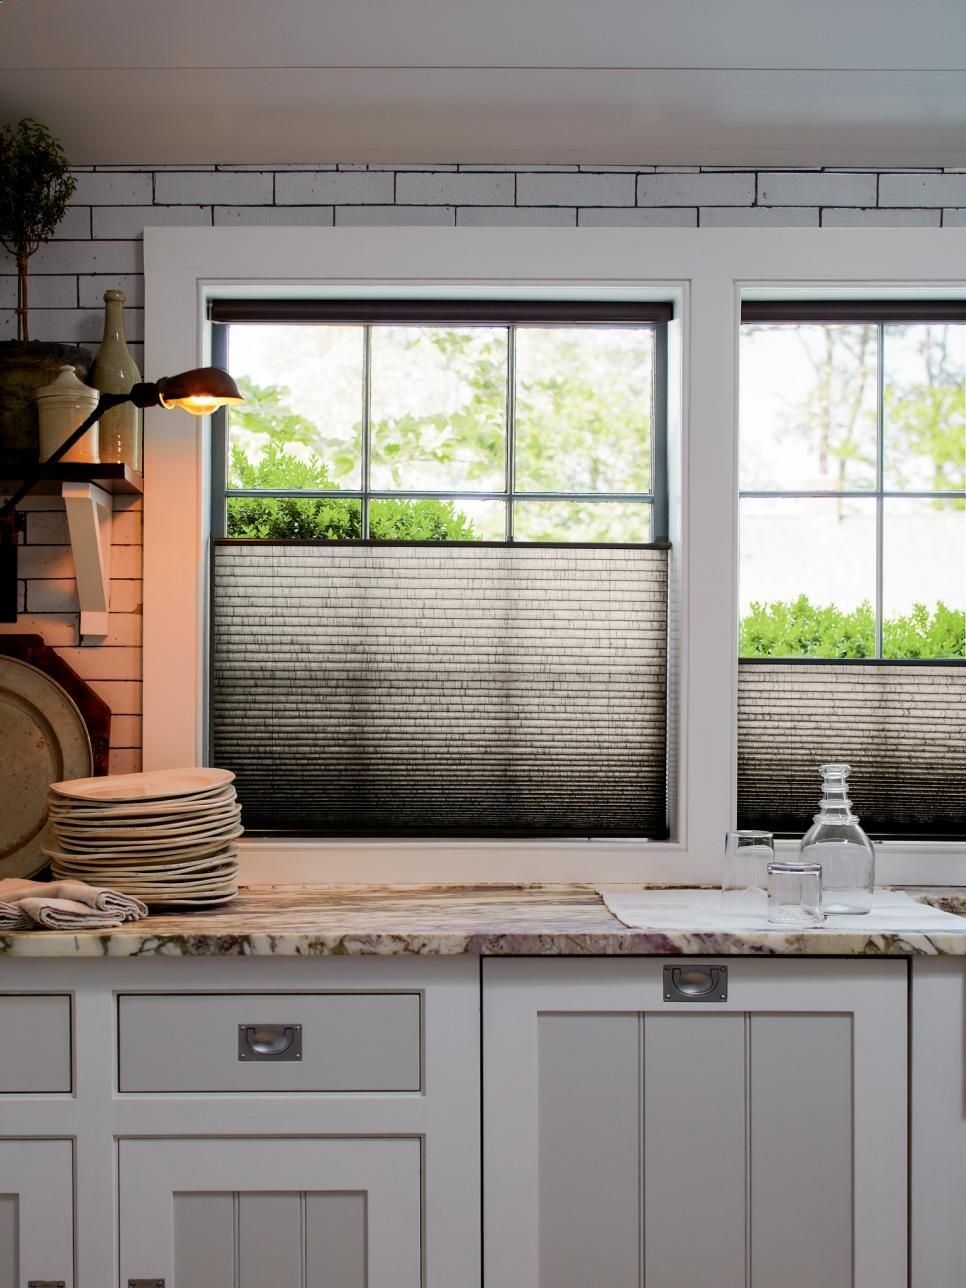 Average Kitchen Window Size | http://navigator-spb.info | Pinterest ...